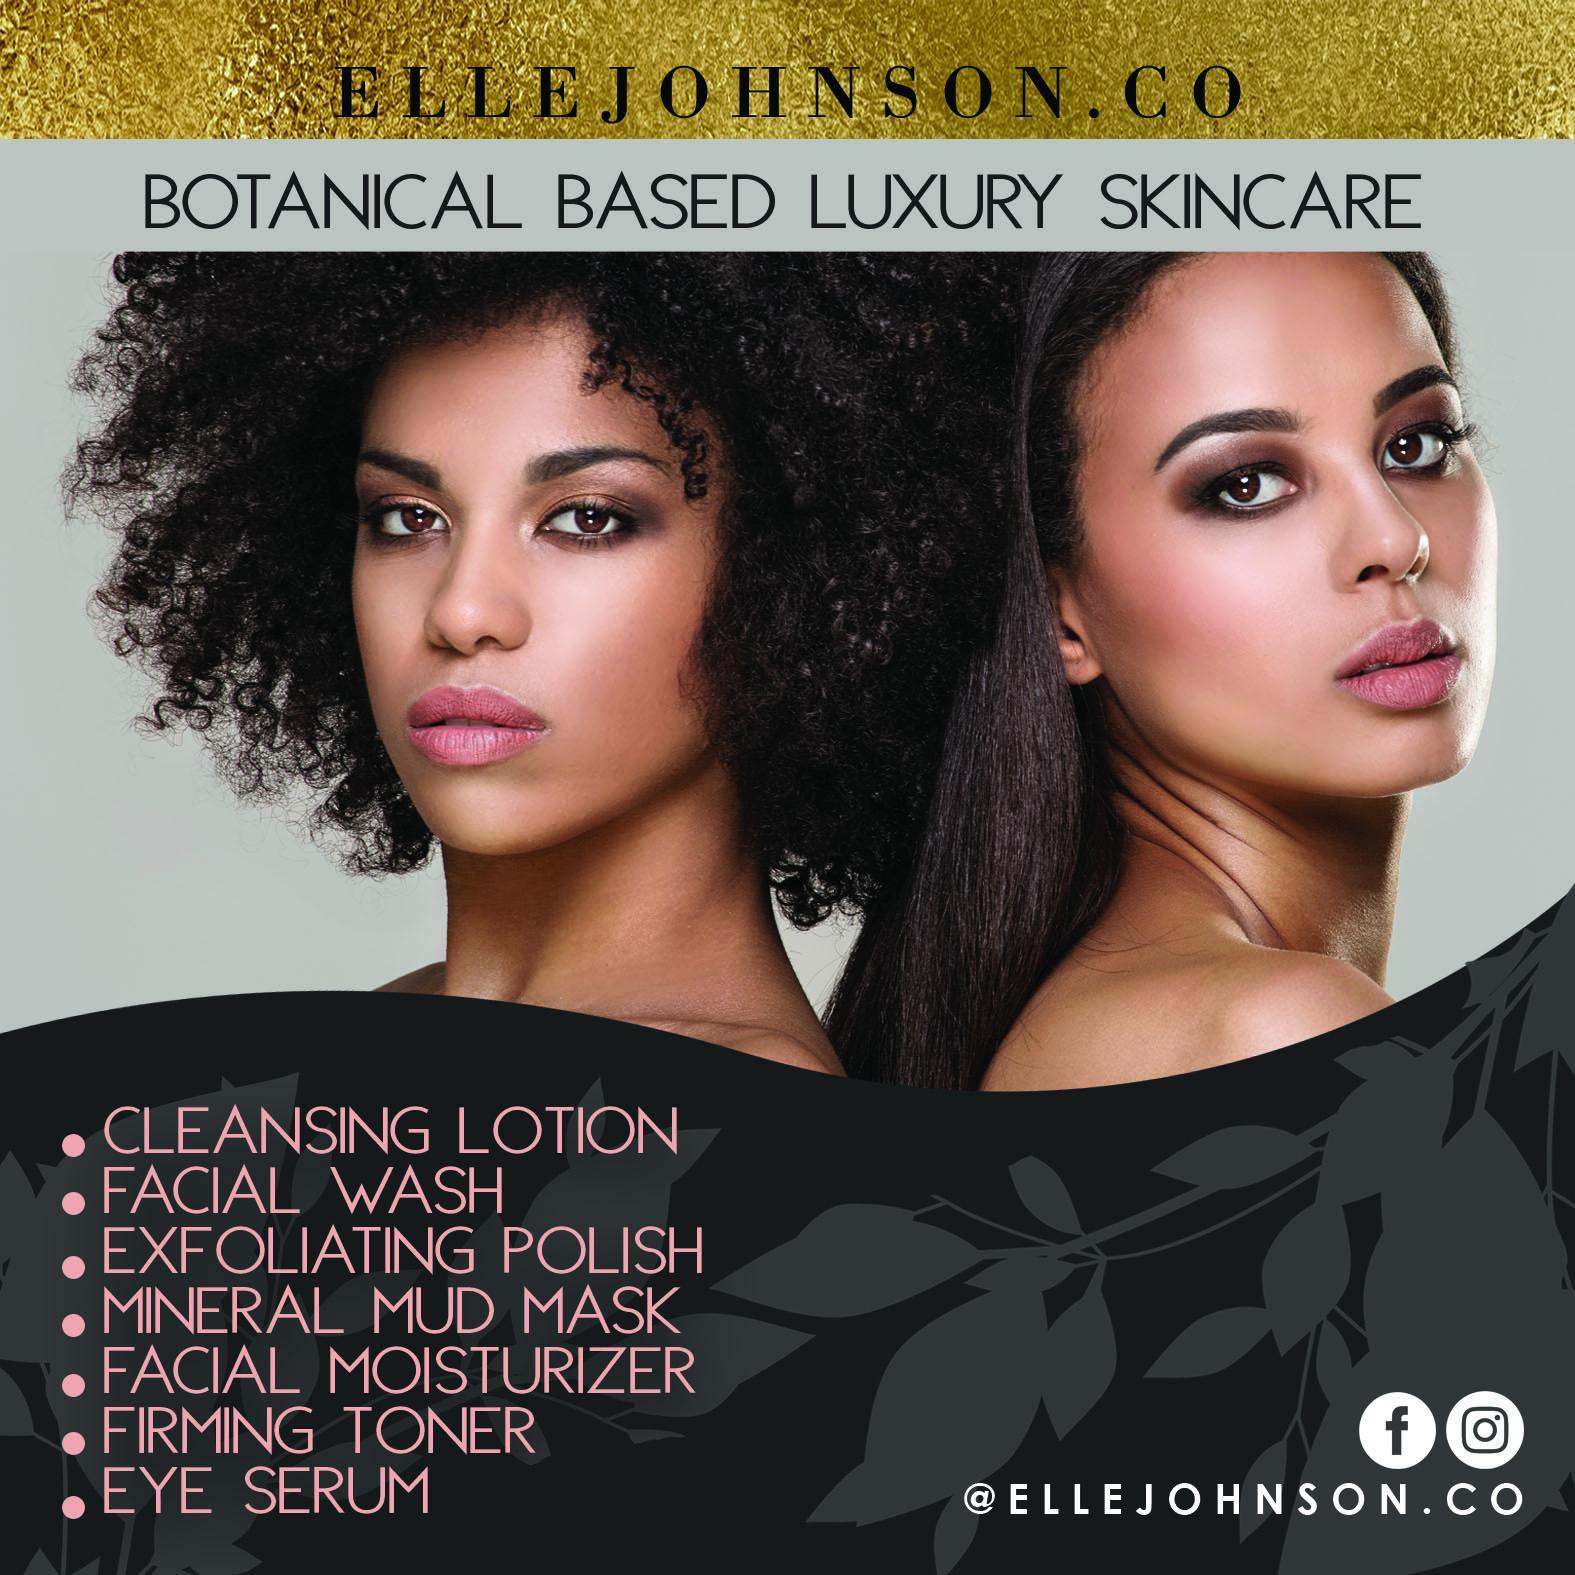 Elle Johnson Co.